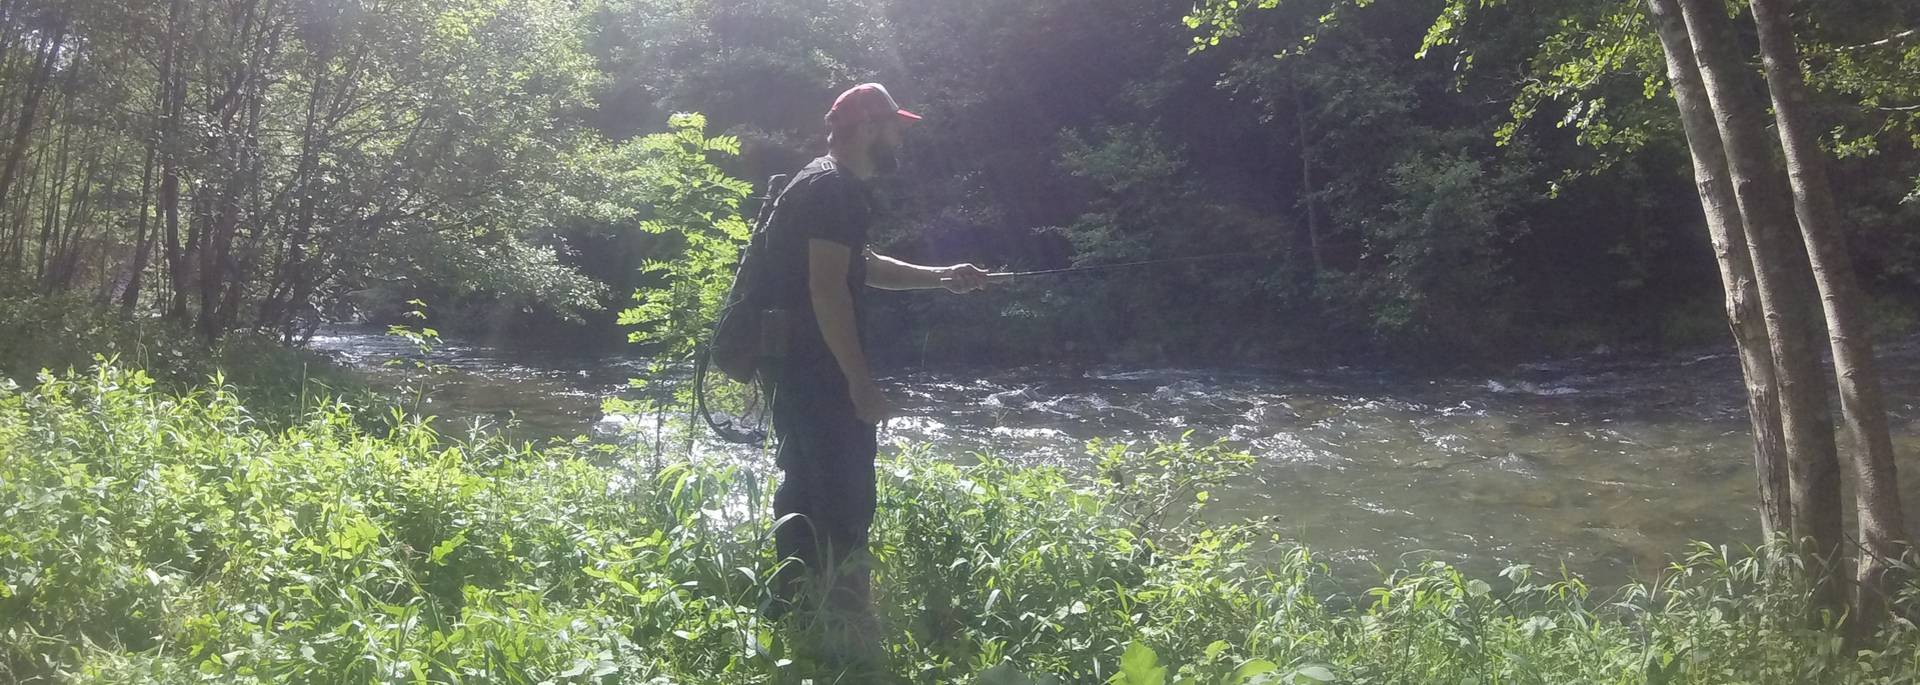 Pêcher dans le Tarn